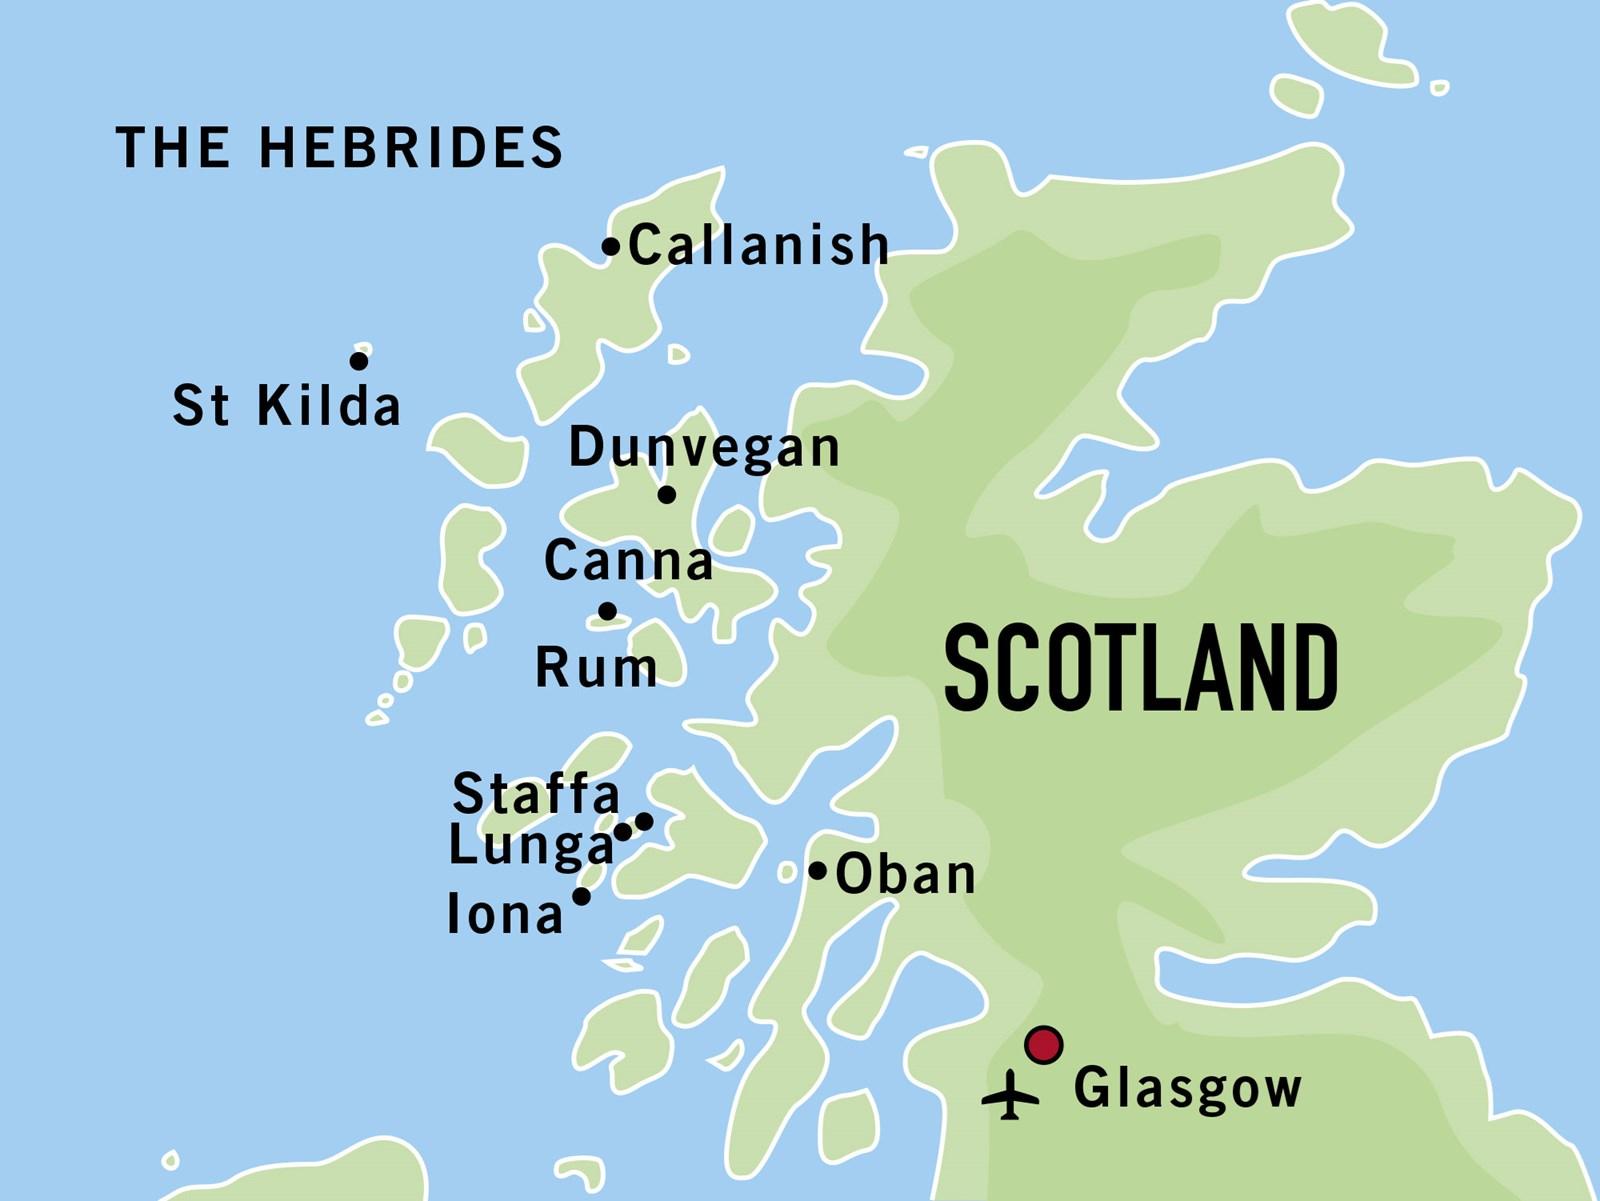 Map for The Hebrides with St Kilda (Stockholm)